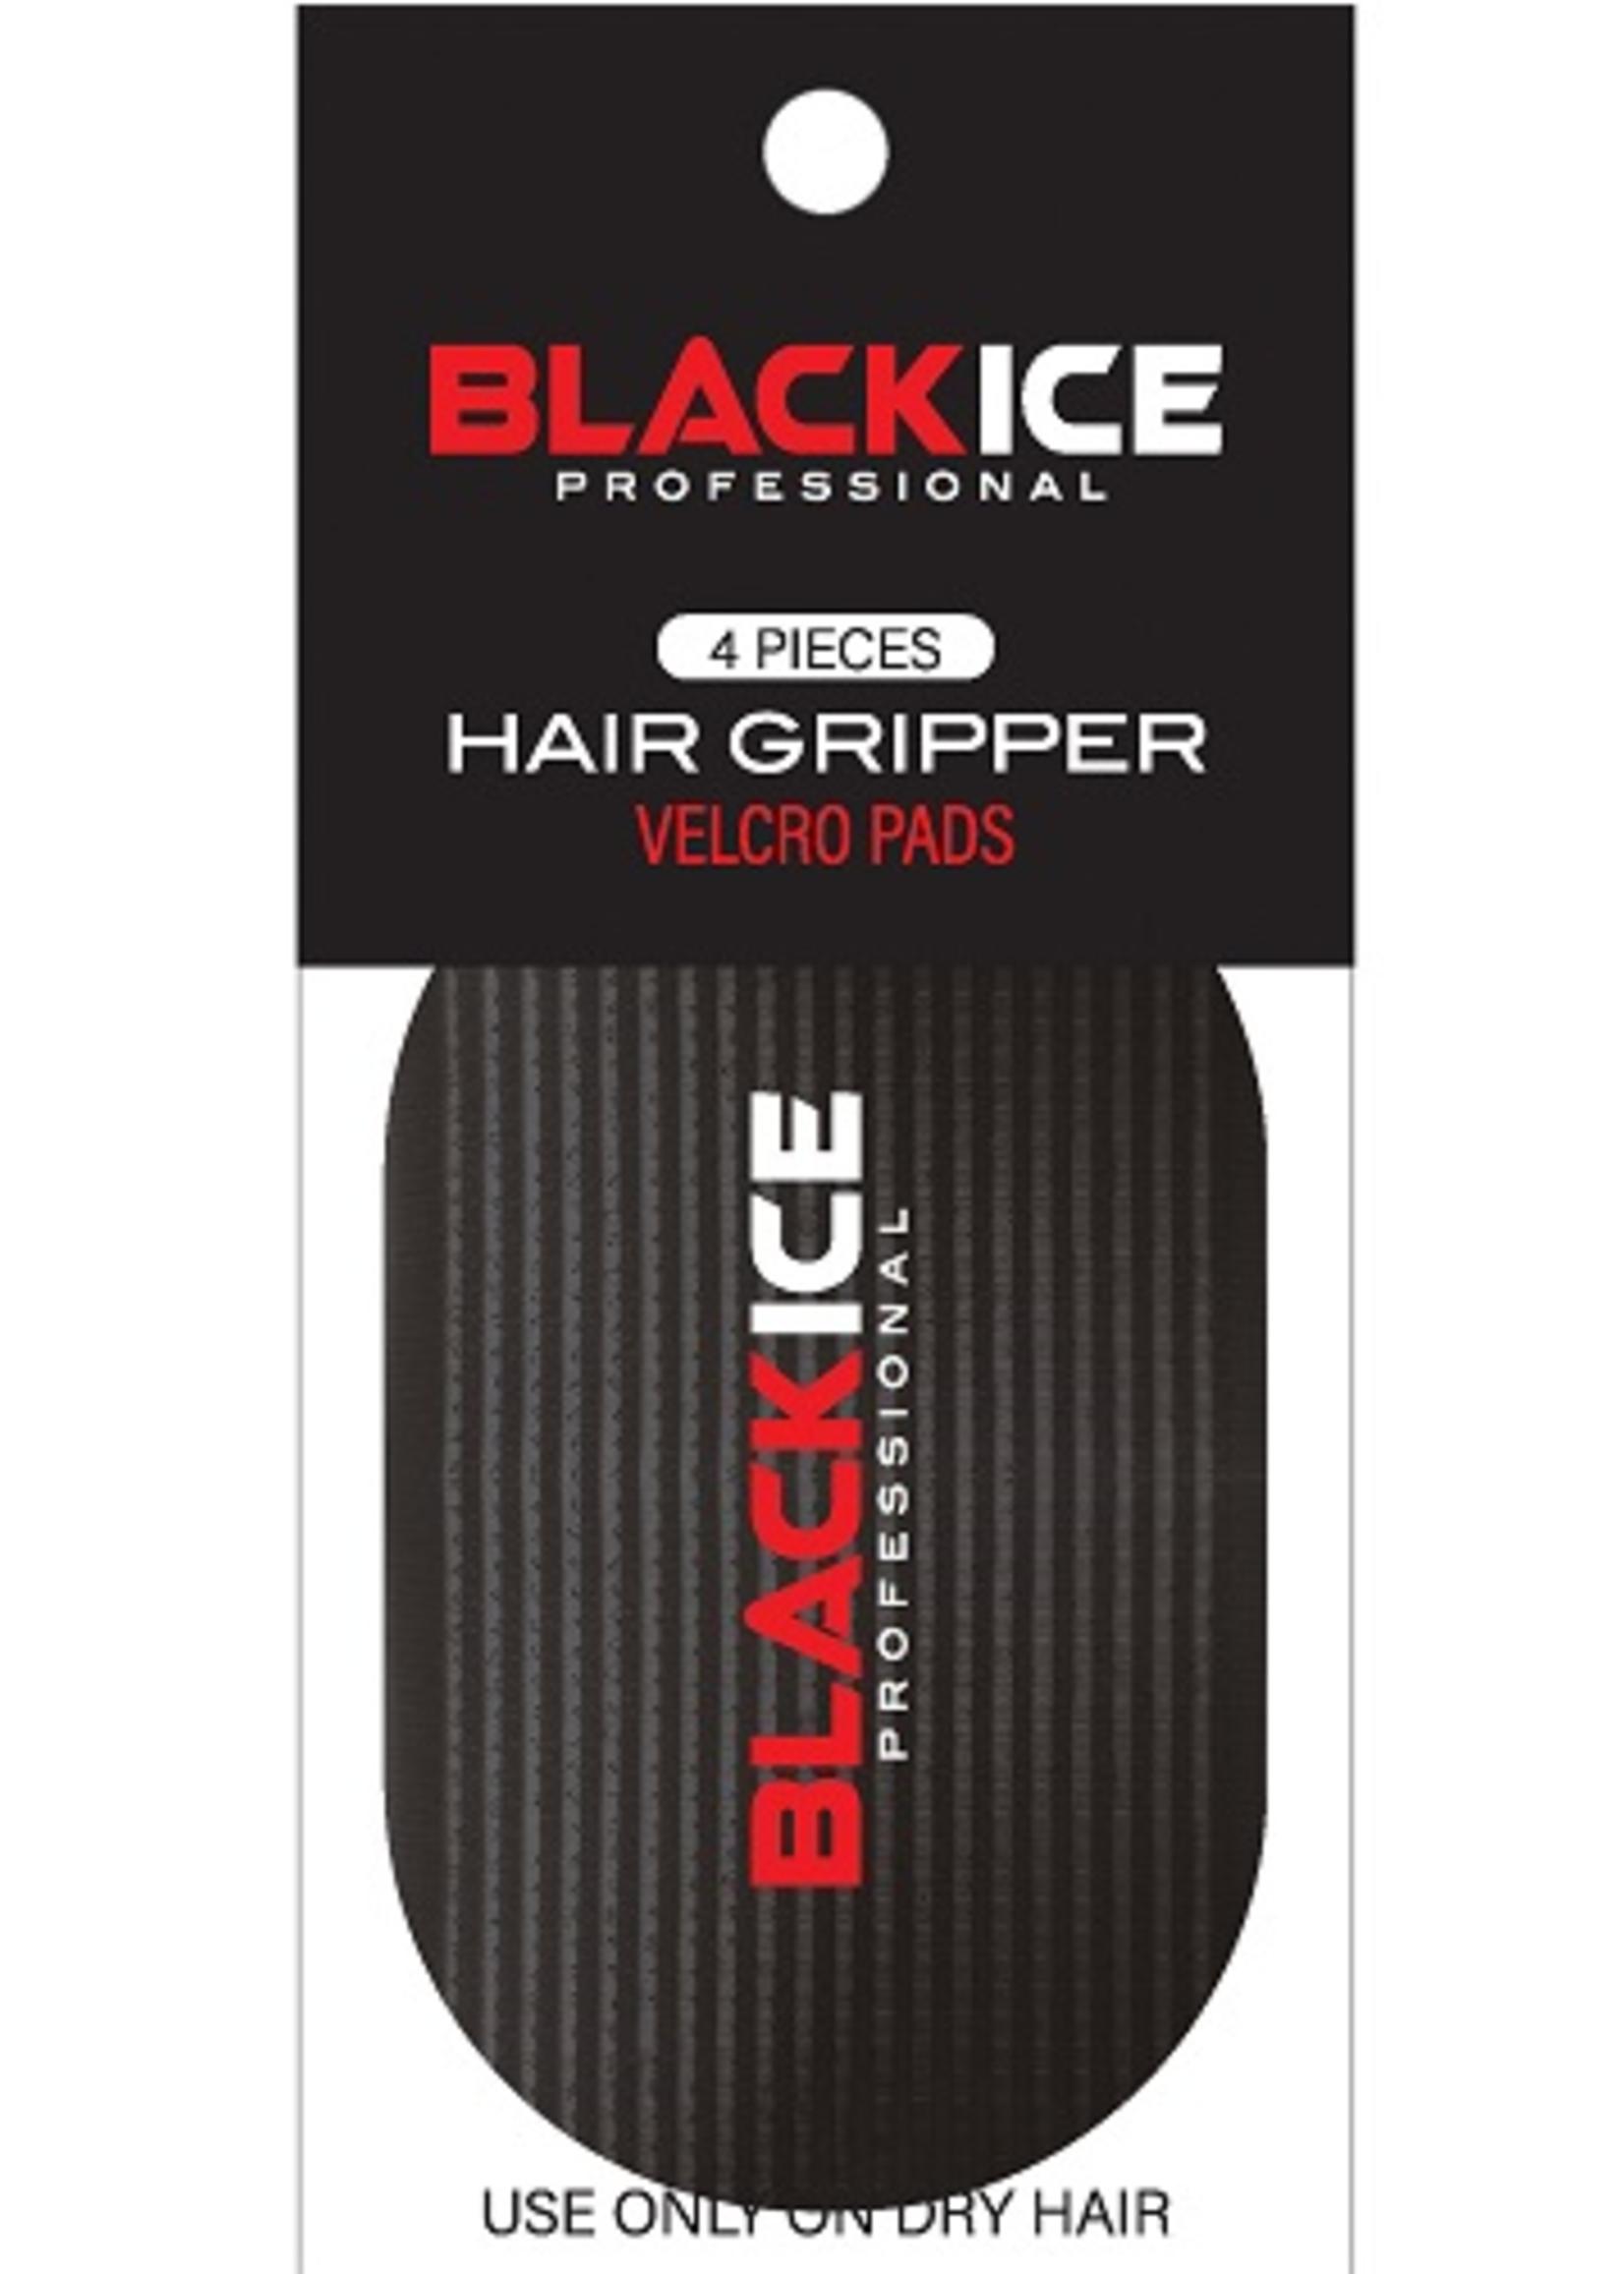 Black Ice Hair Gripper, Black